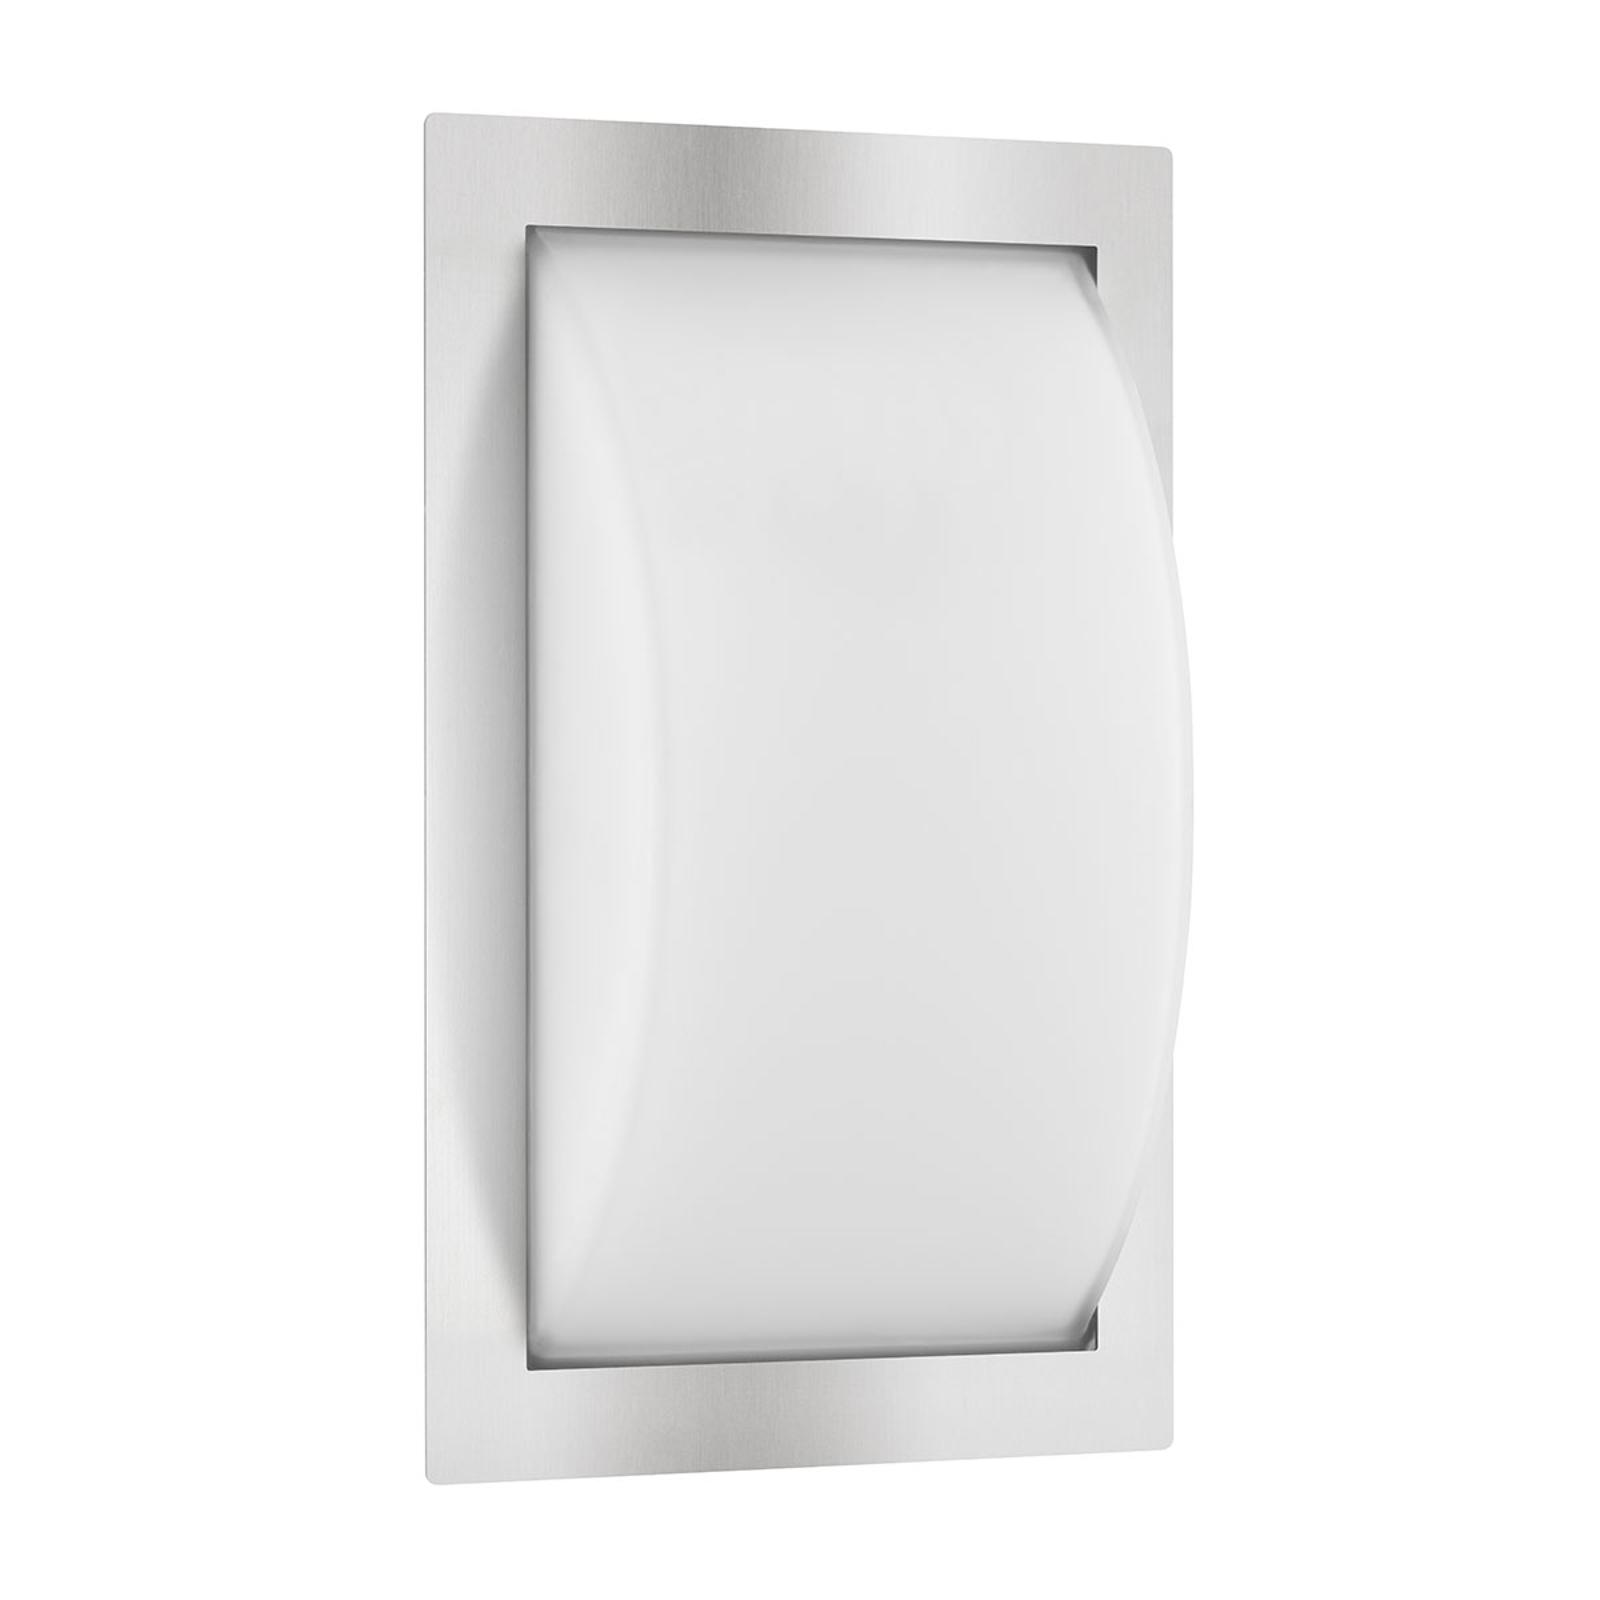 LED buitenwandlamp Ivett roestvrij staal